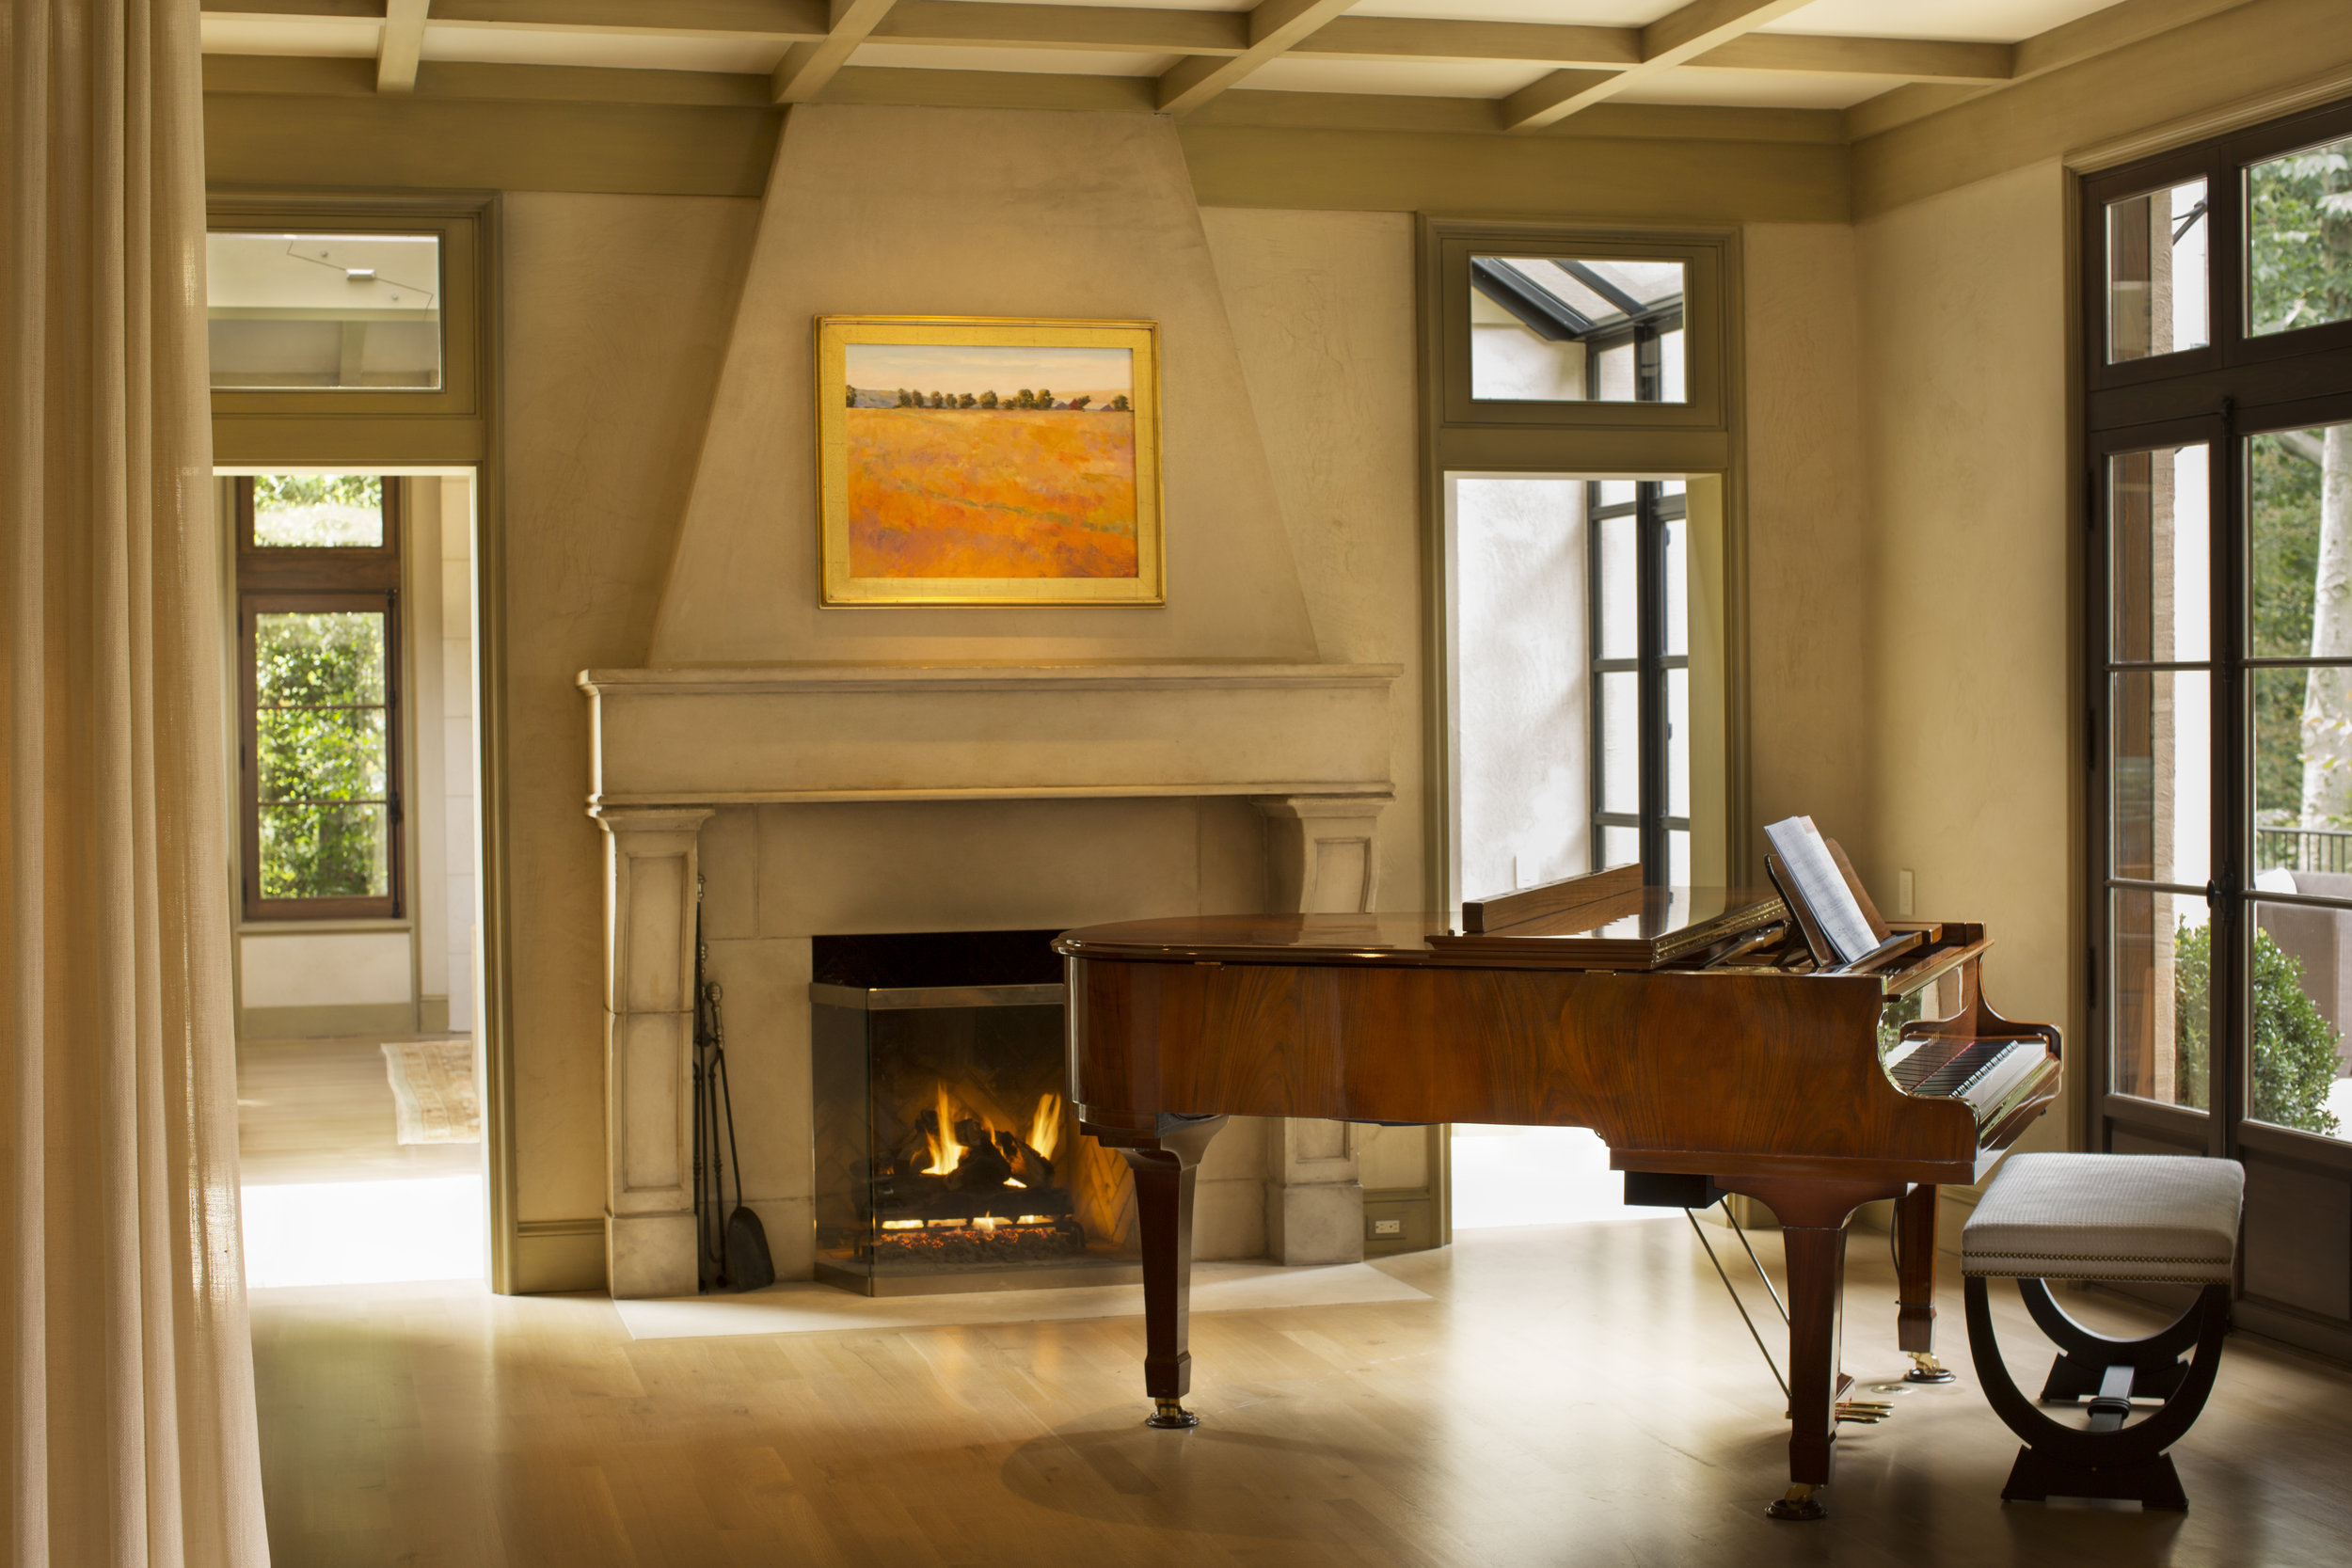 5C2_piano_room-7968.jpg